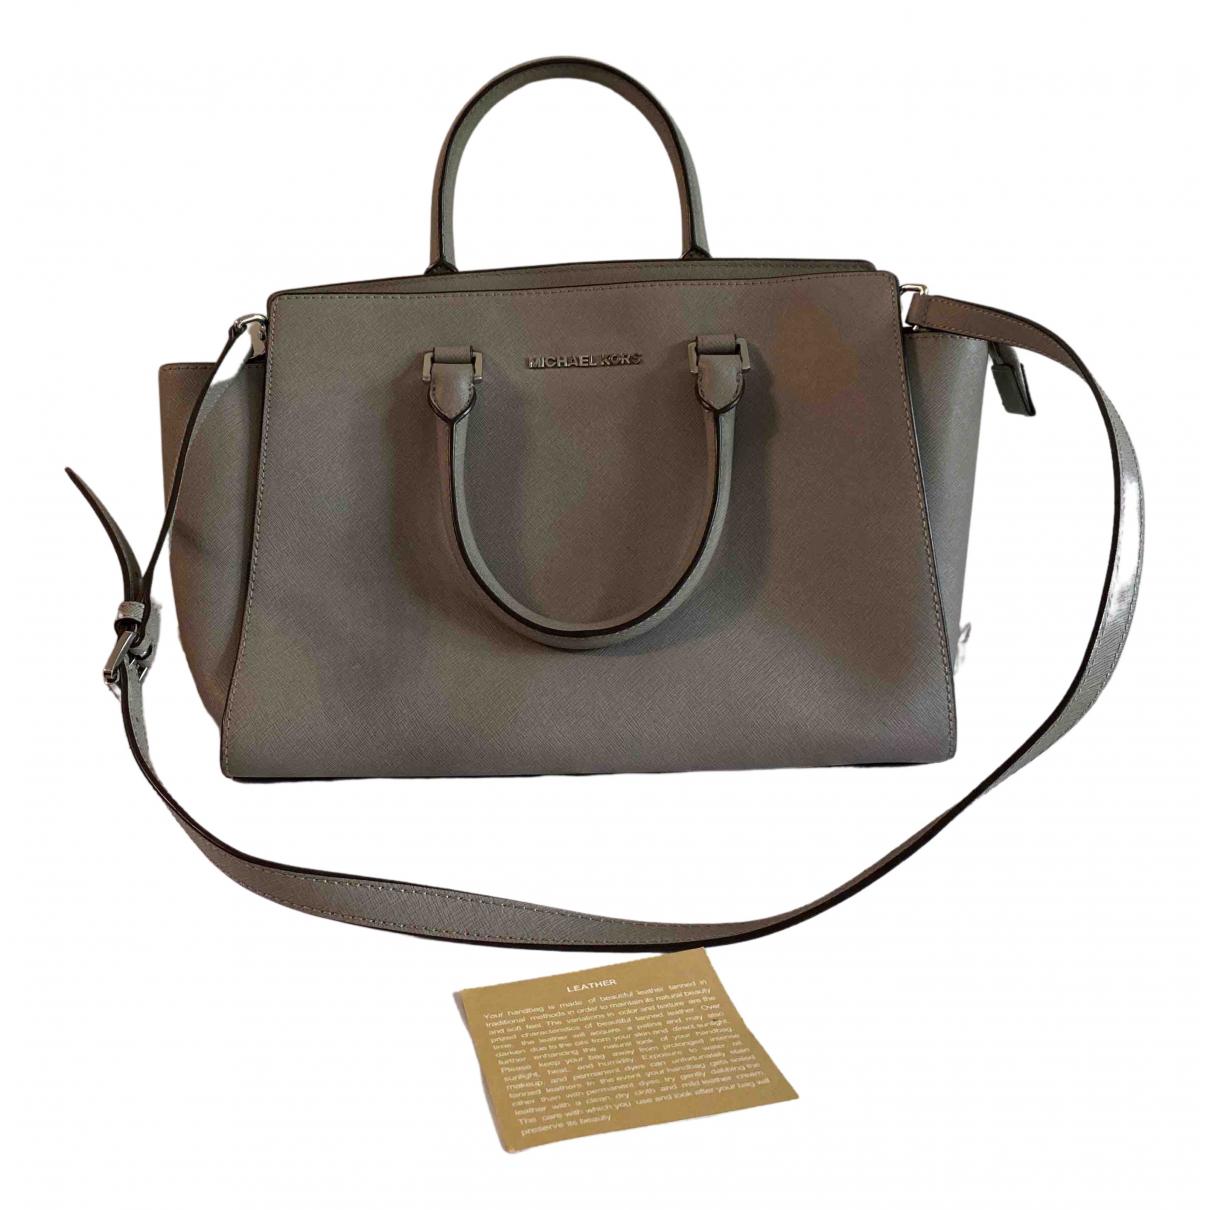 Michael Kors Selma Grey Leather handbag for Women N